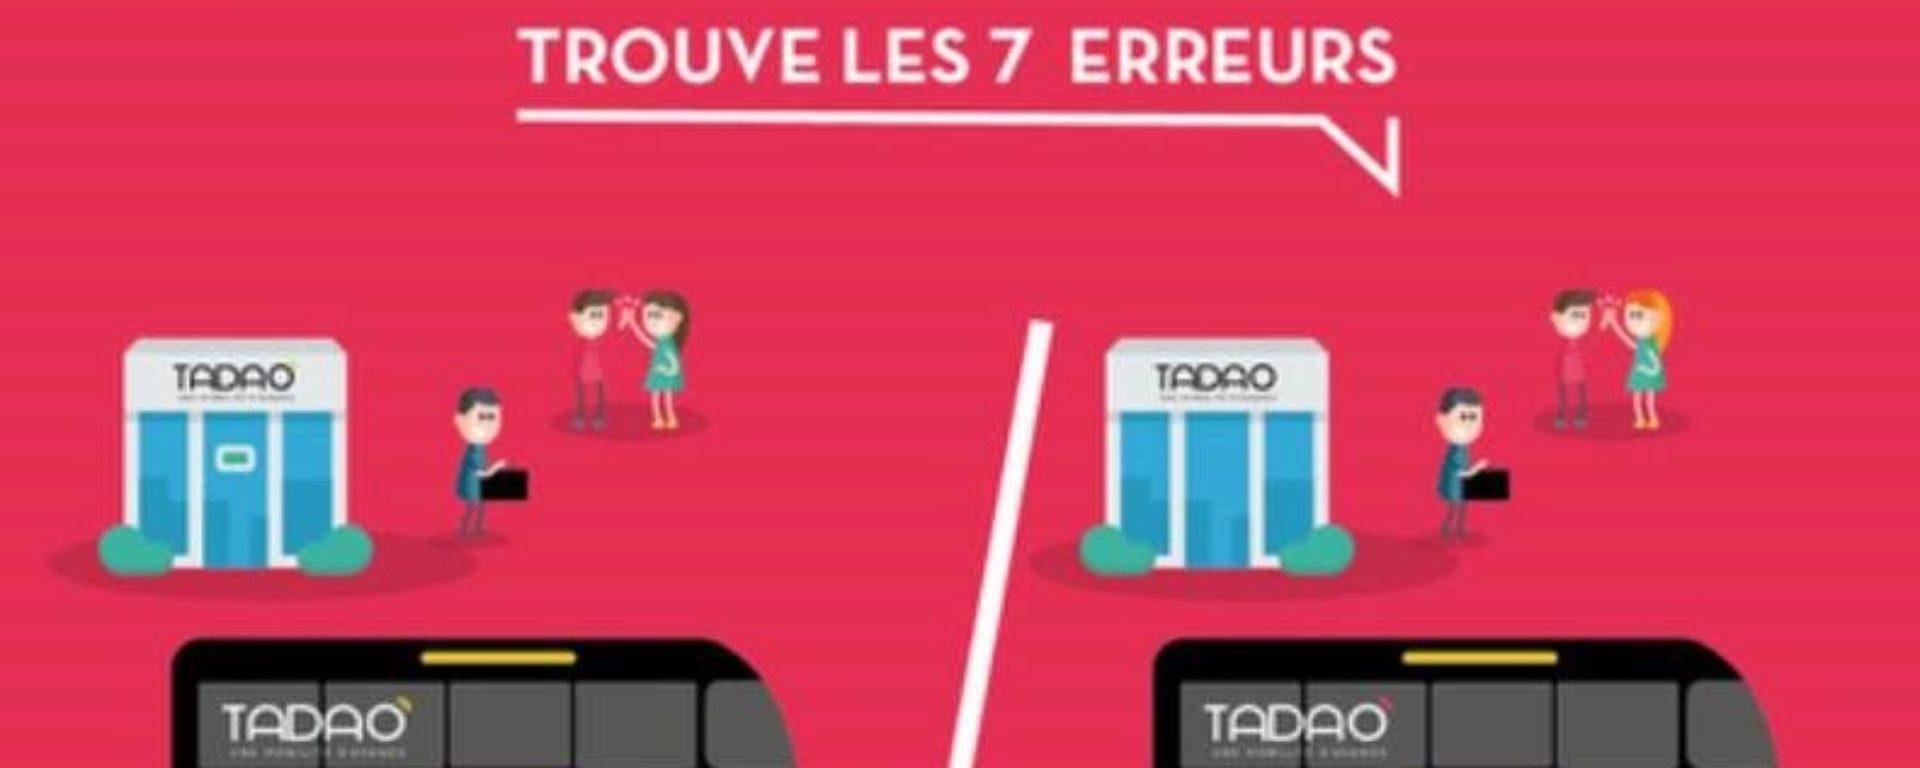 tadao-transdev-reseau-social-media-jeu-distraction